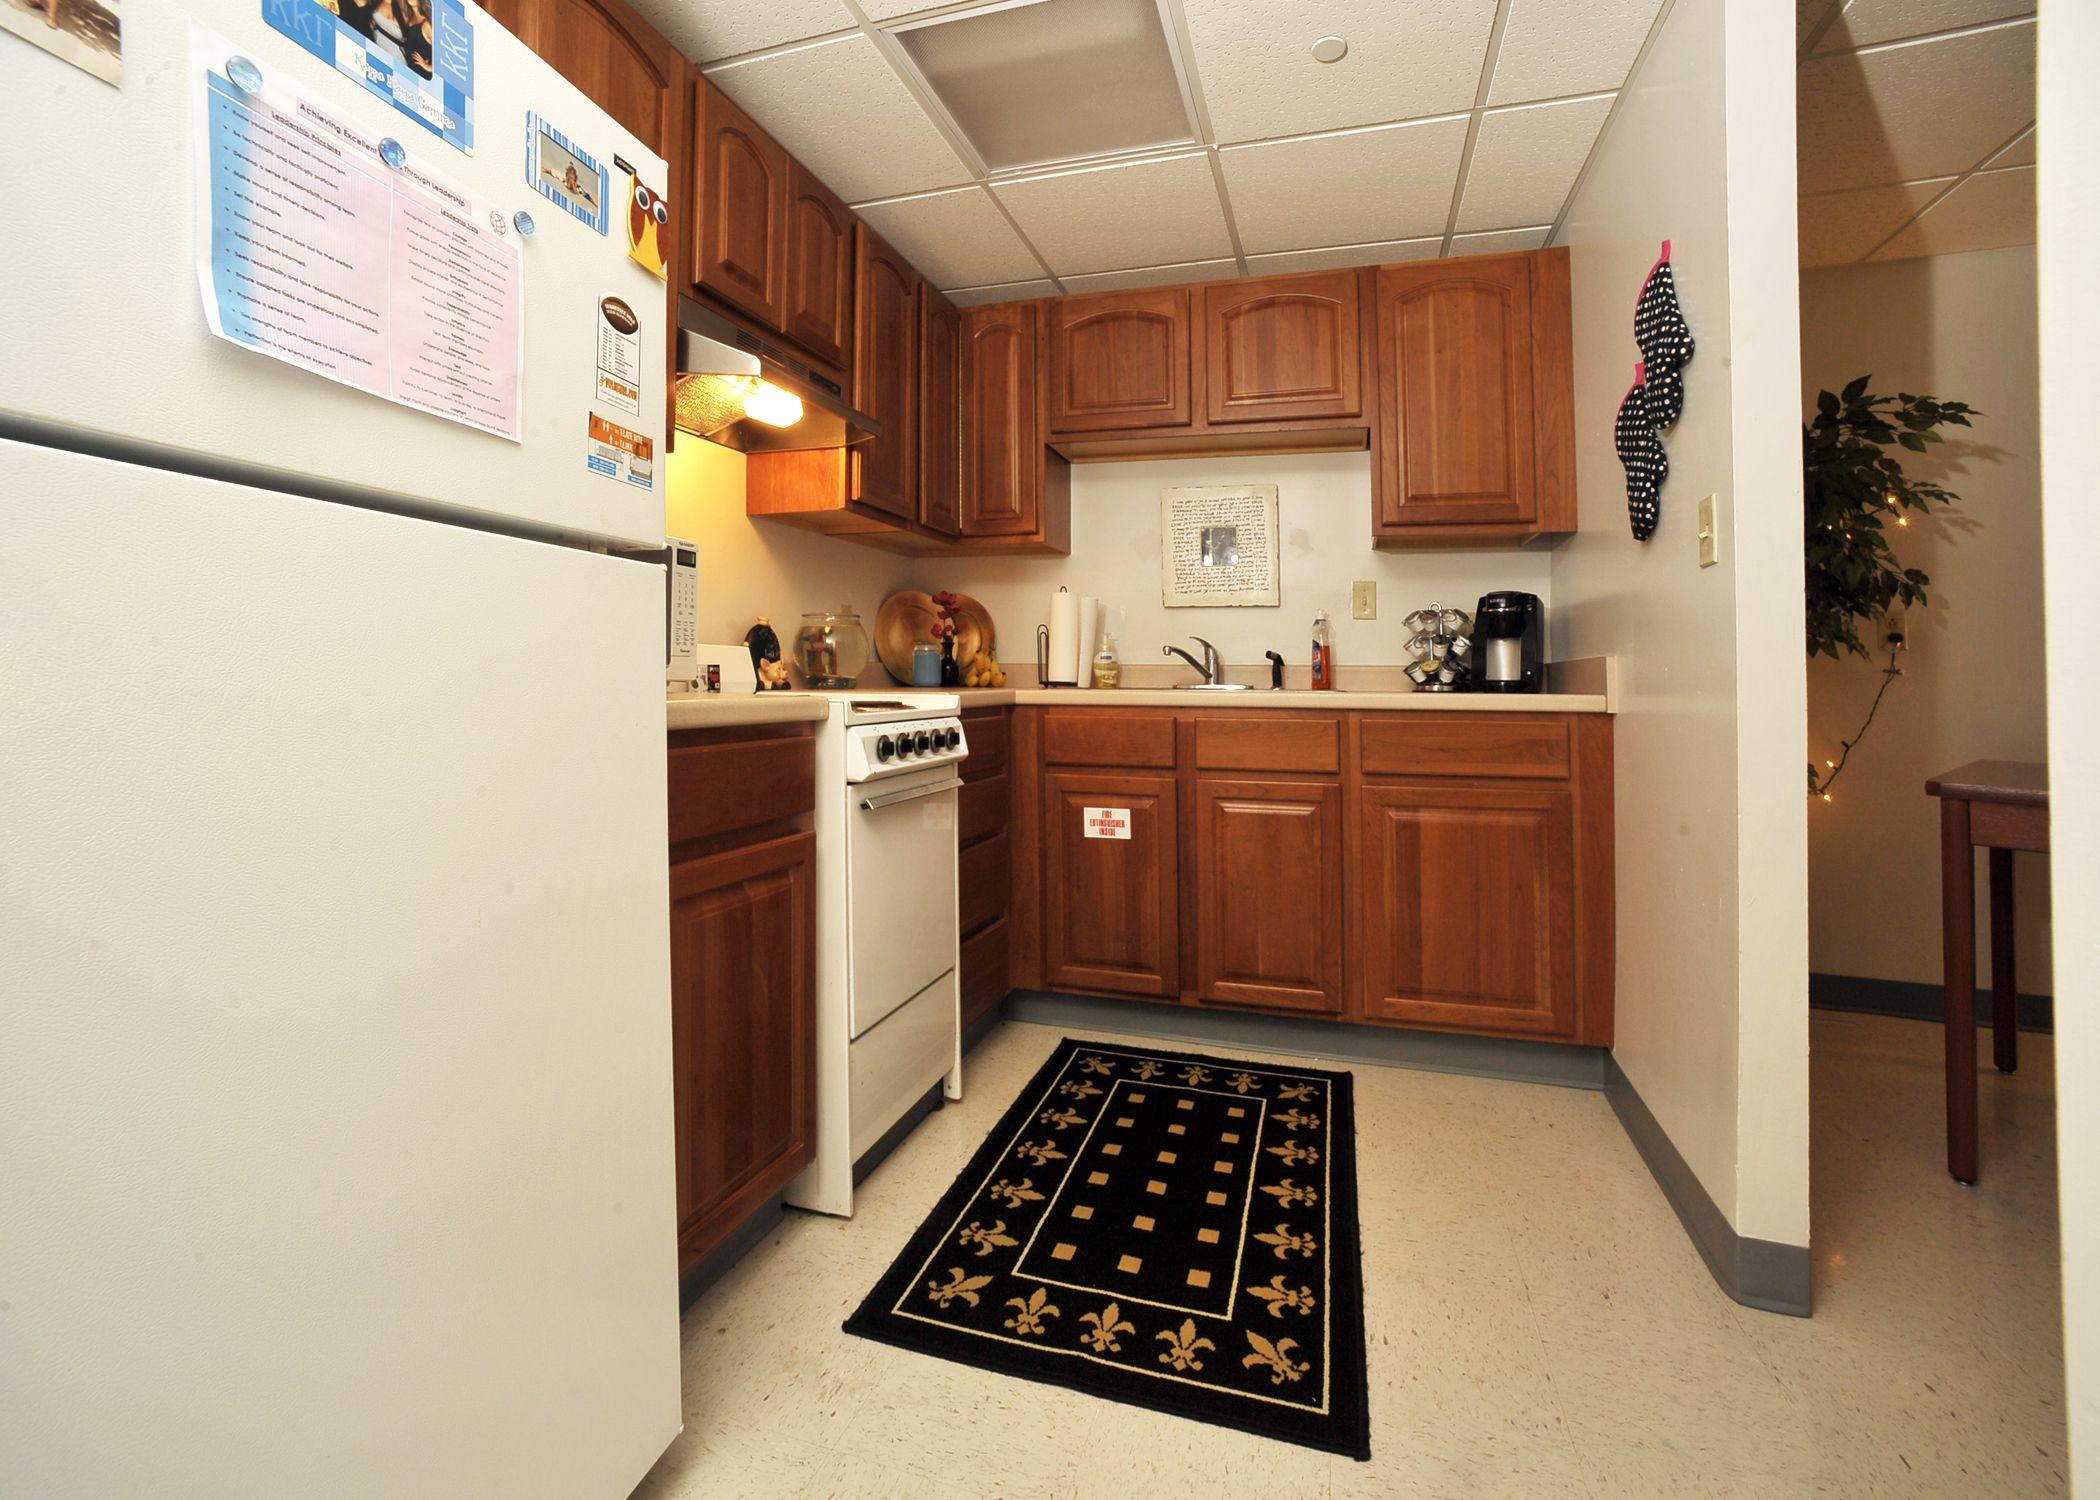 Kitchen Cabinets, Dorm Room